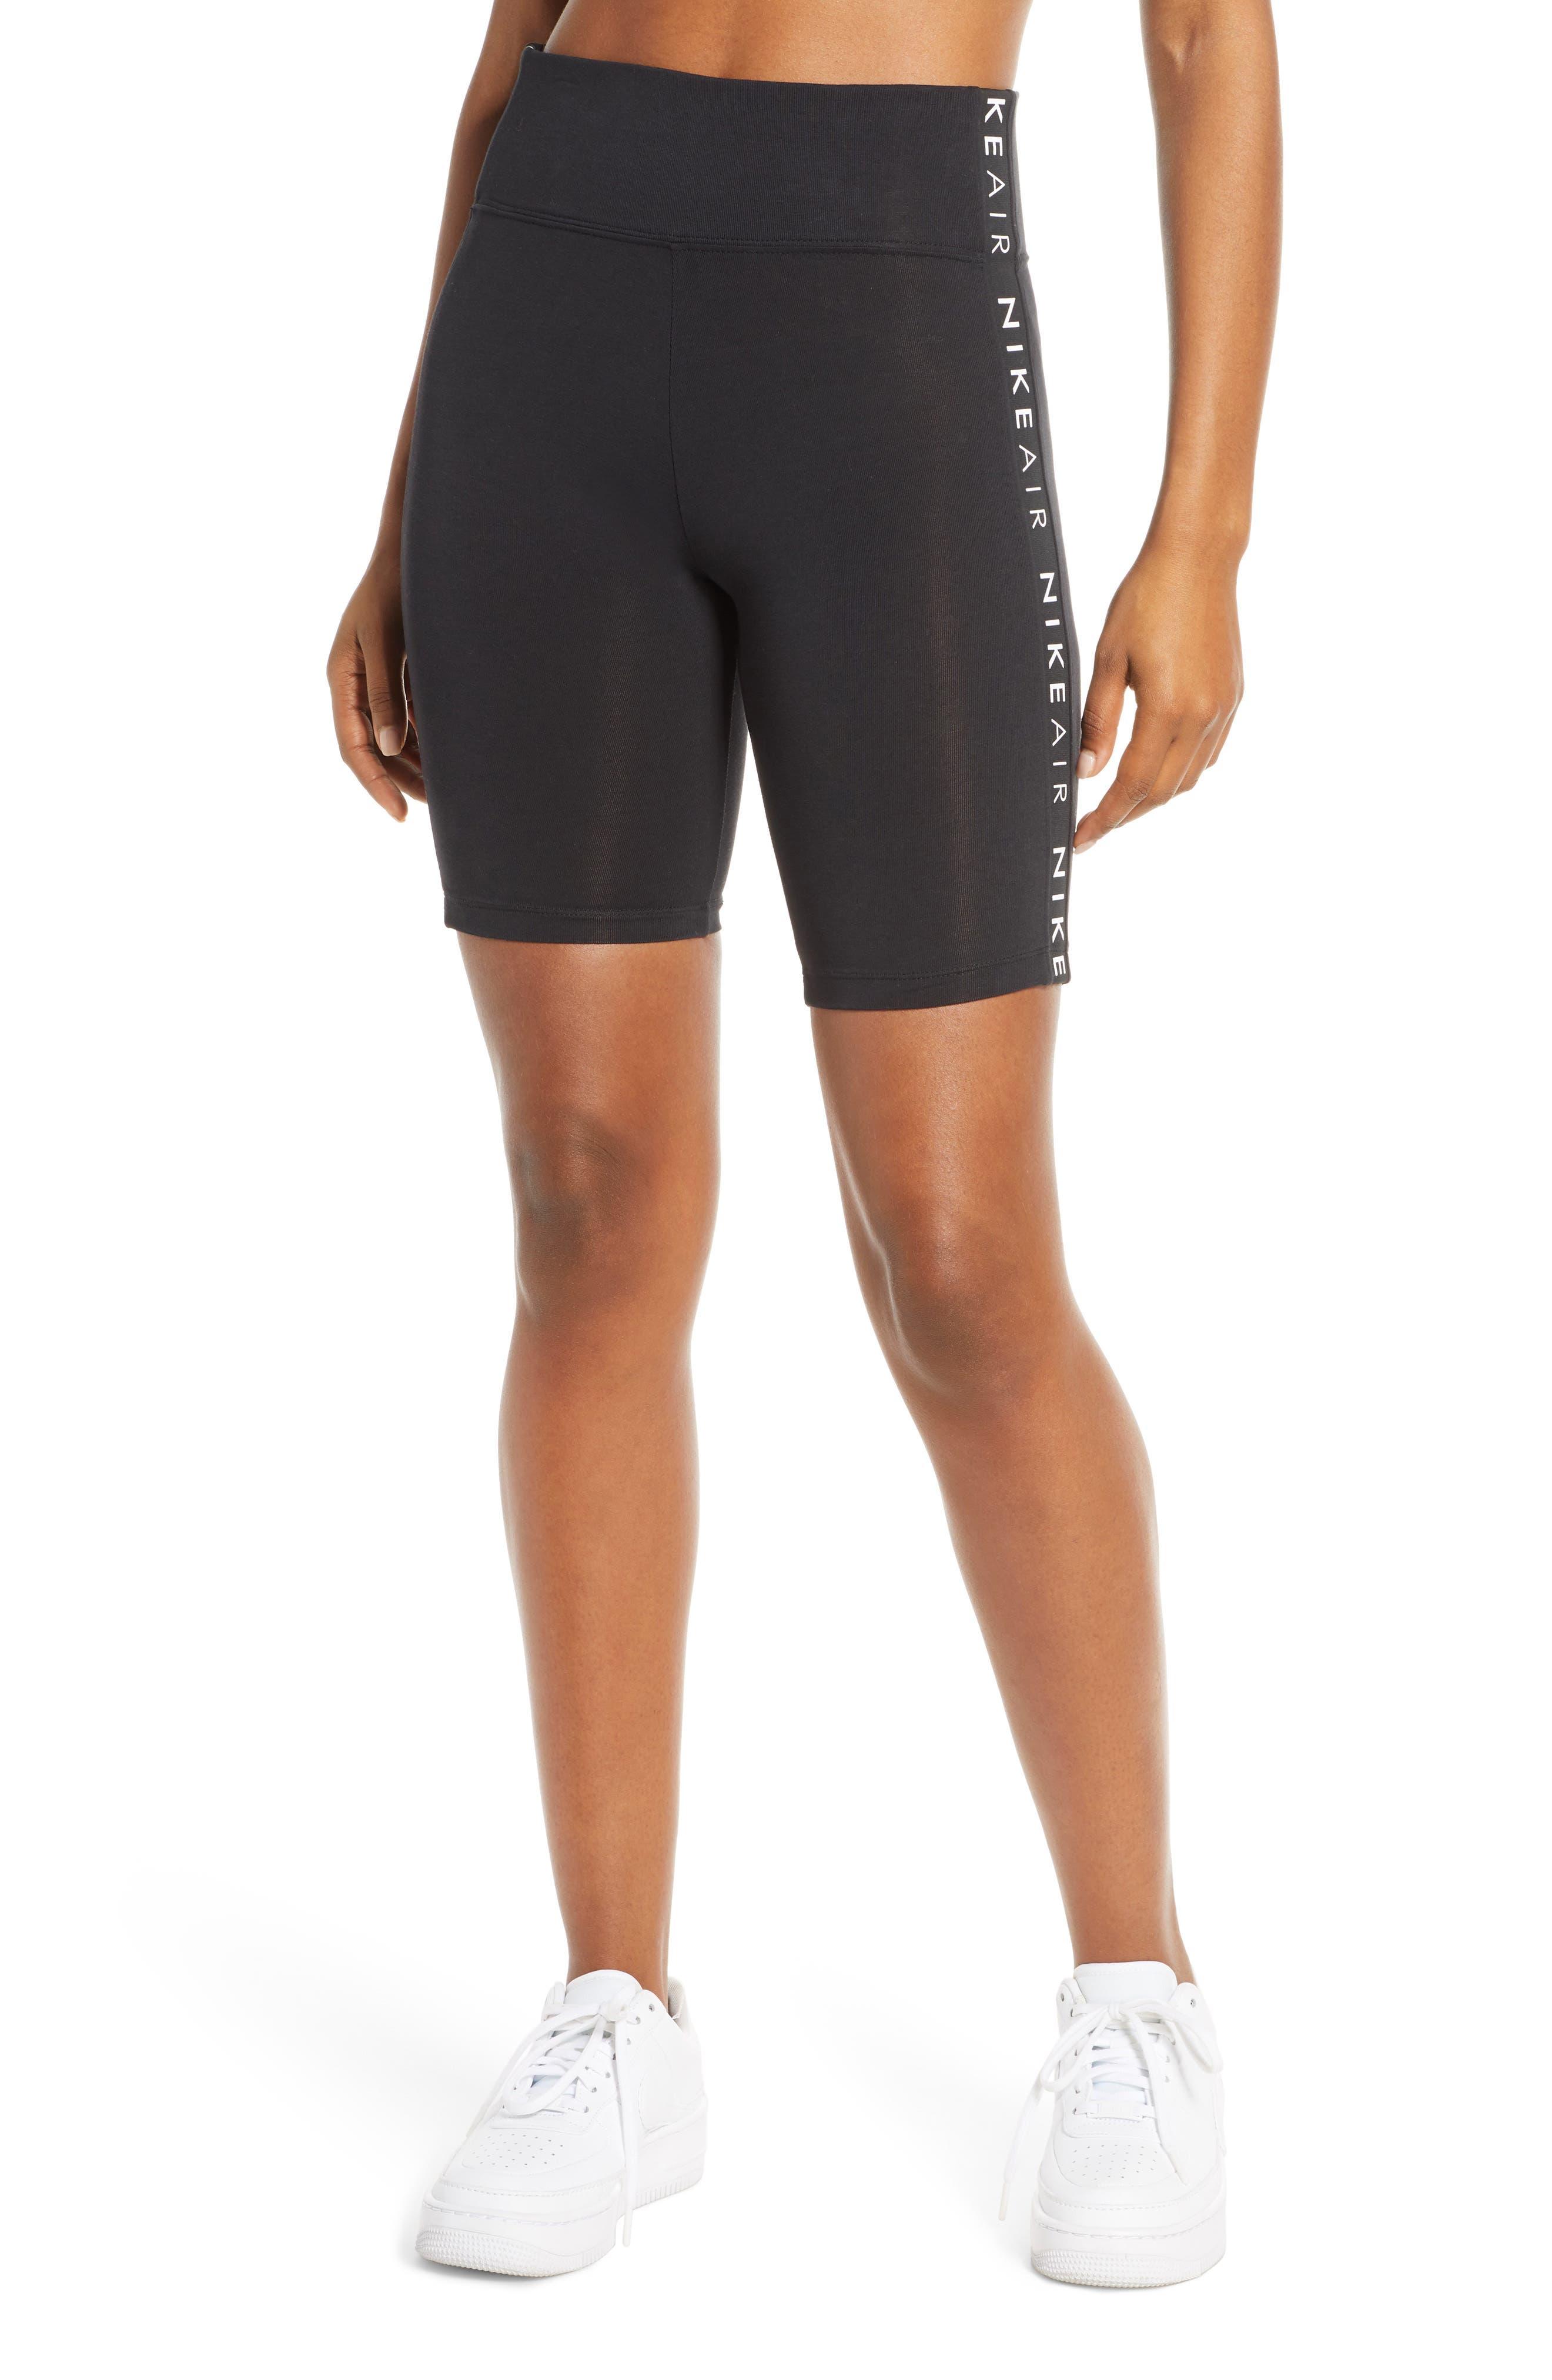 Nike Sportswear Air Bike Shorts